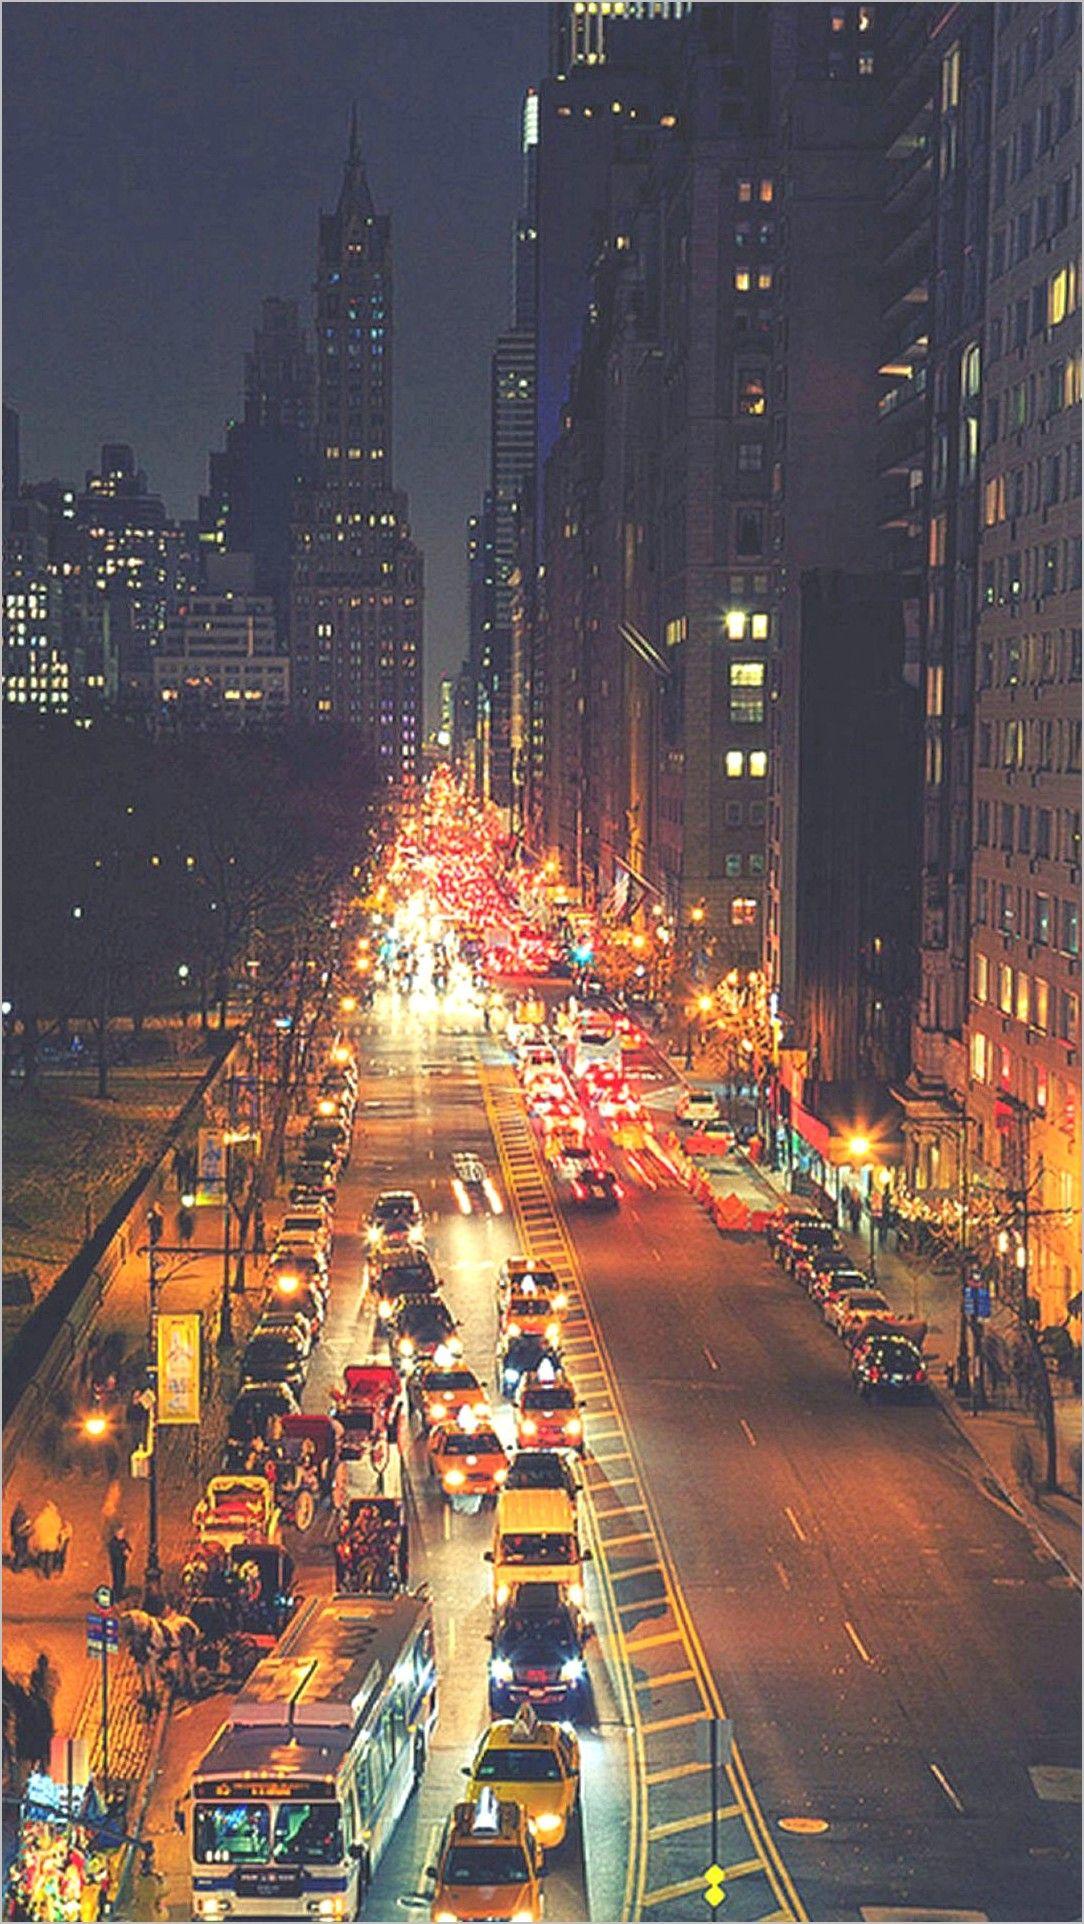 City 4k Wallpaper Street Level Beautiful Places Night City Scenery